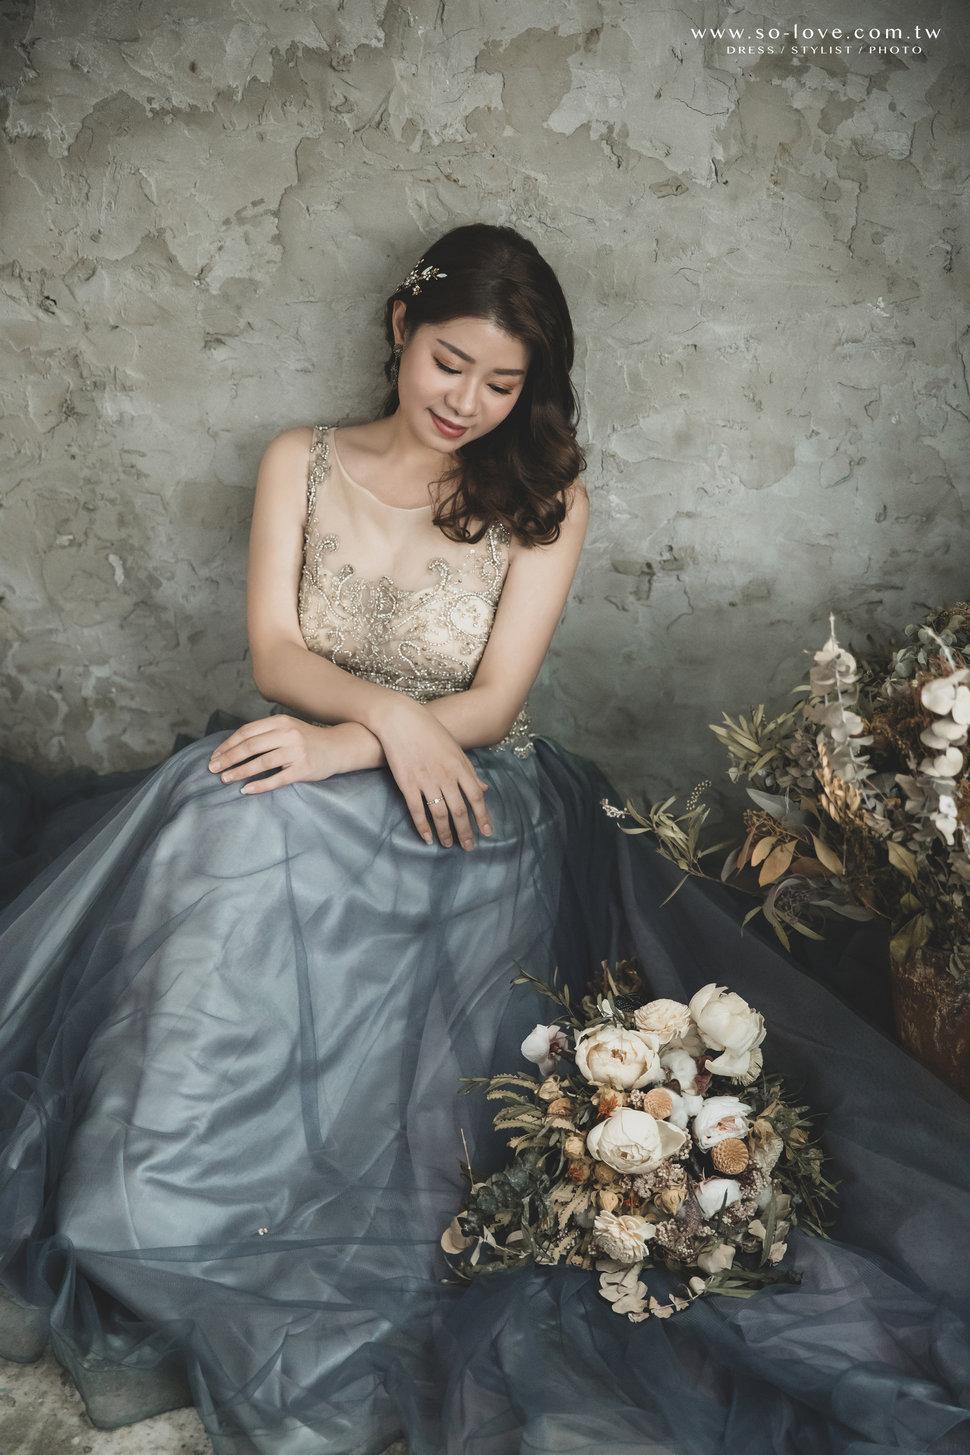 RYAN8252 - So.Love Wedding 樂樂蕾絲《結婚吧》